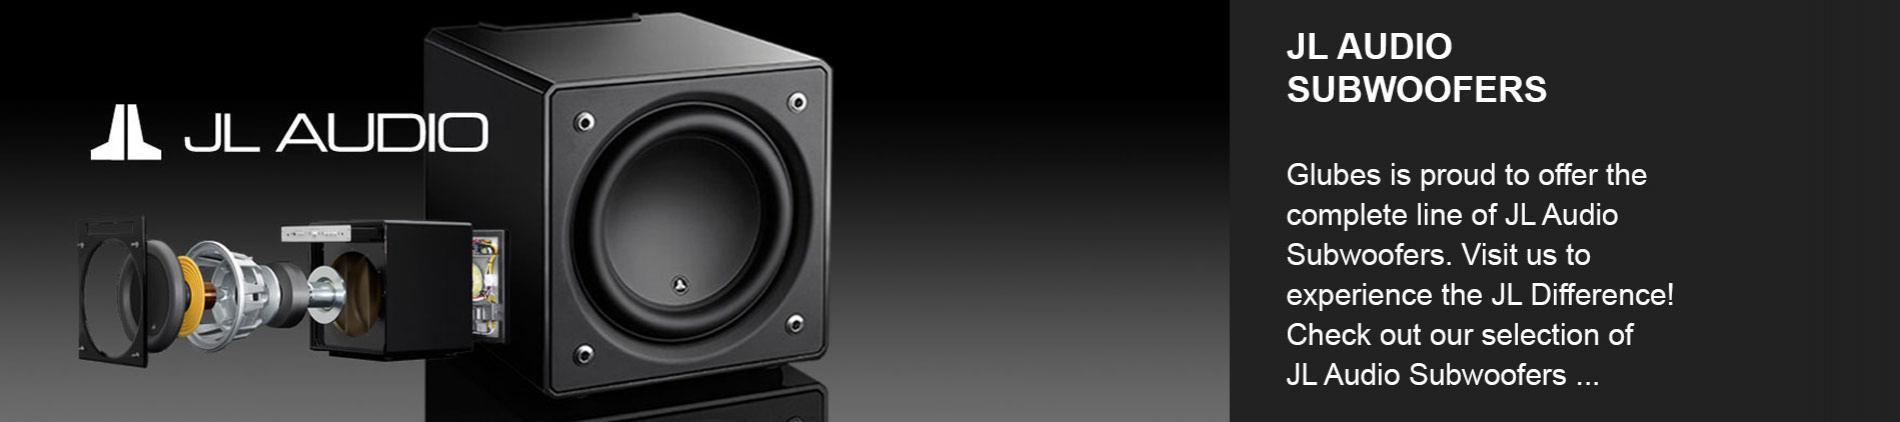 JL Audio,subwoofer,audio,component